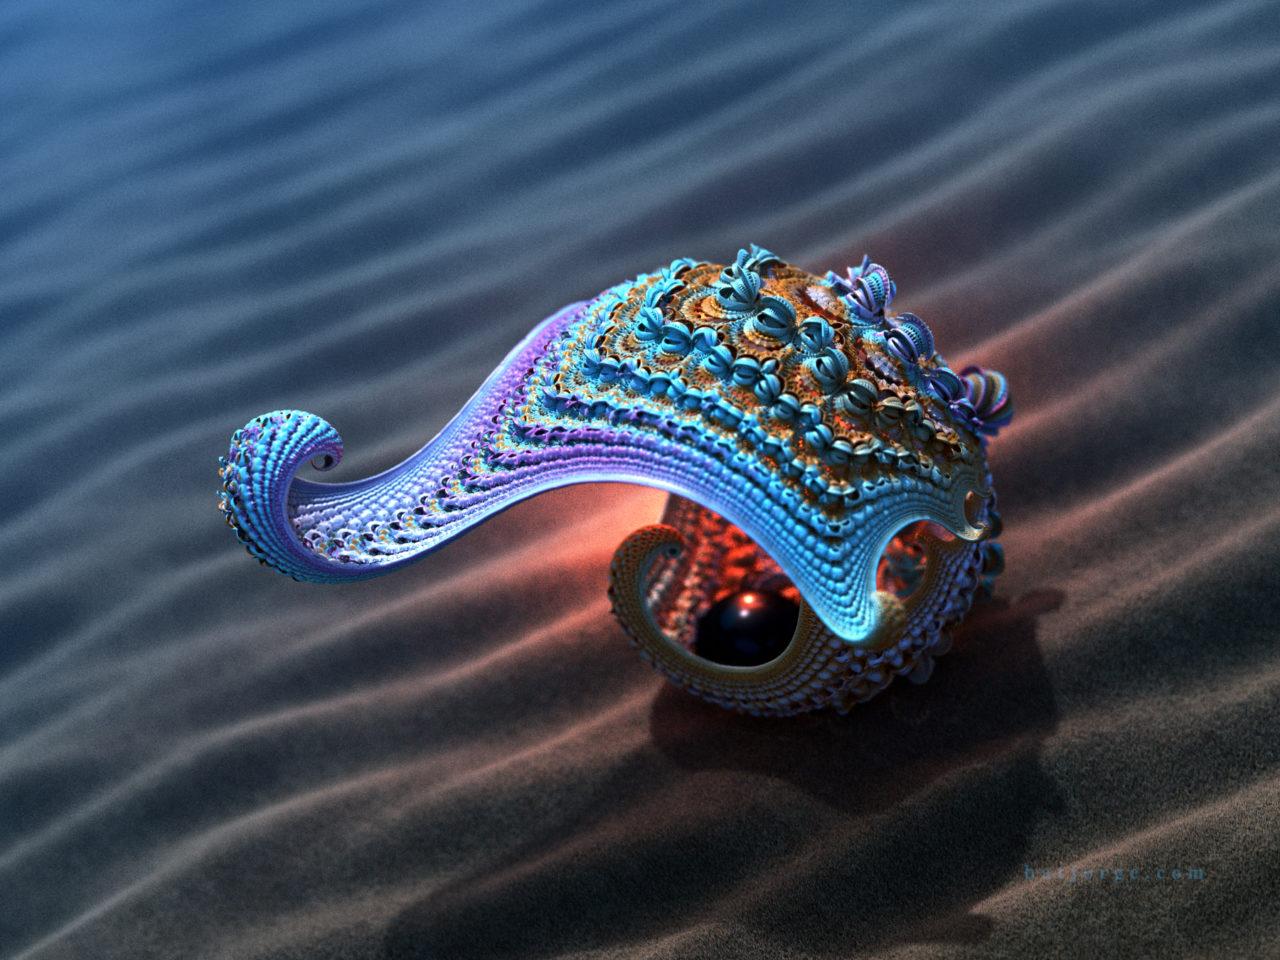 3d fractal. kleinian. mandelbulber with sphere.